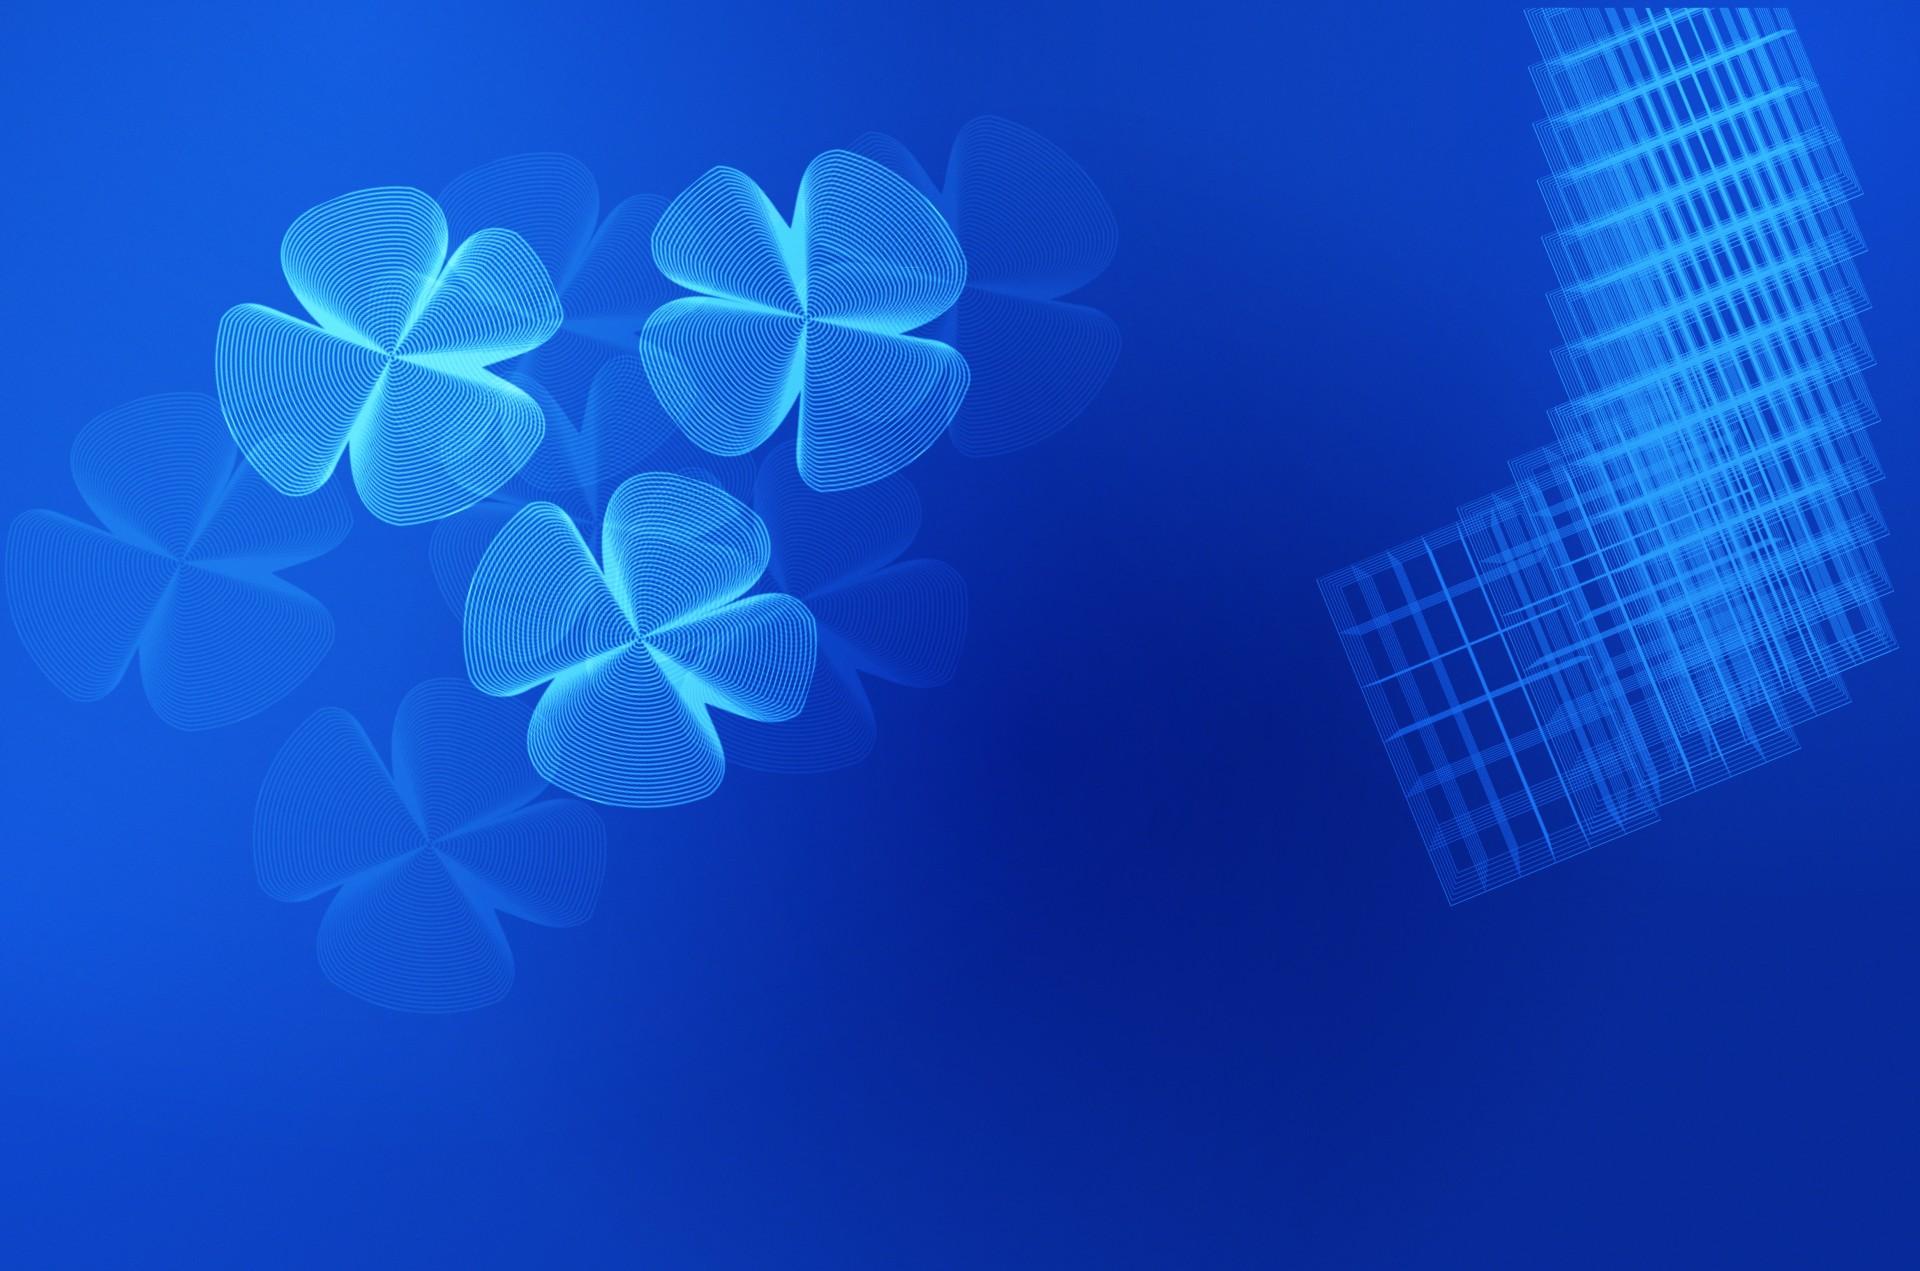 Blue FourLeaf Clover Background Free Stock Photo  Public